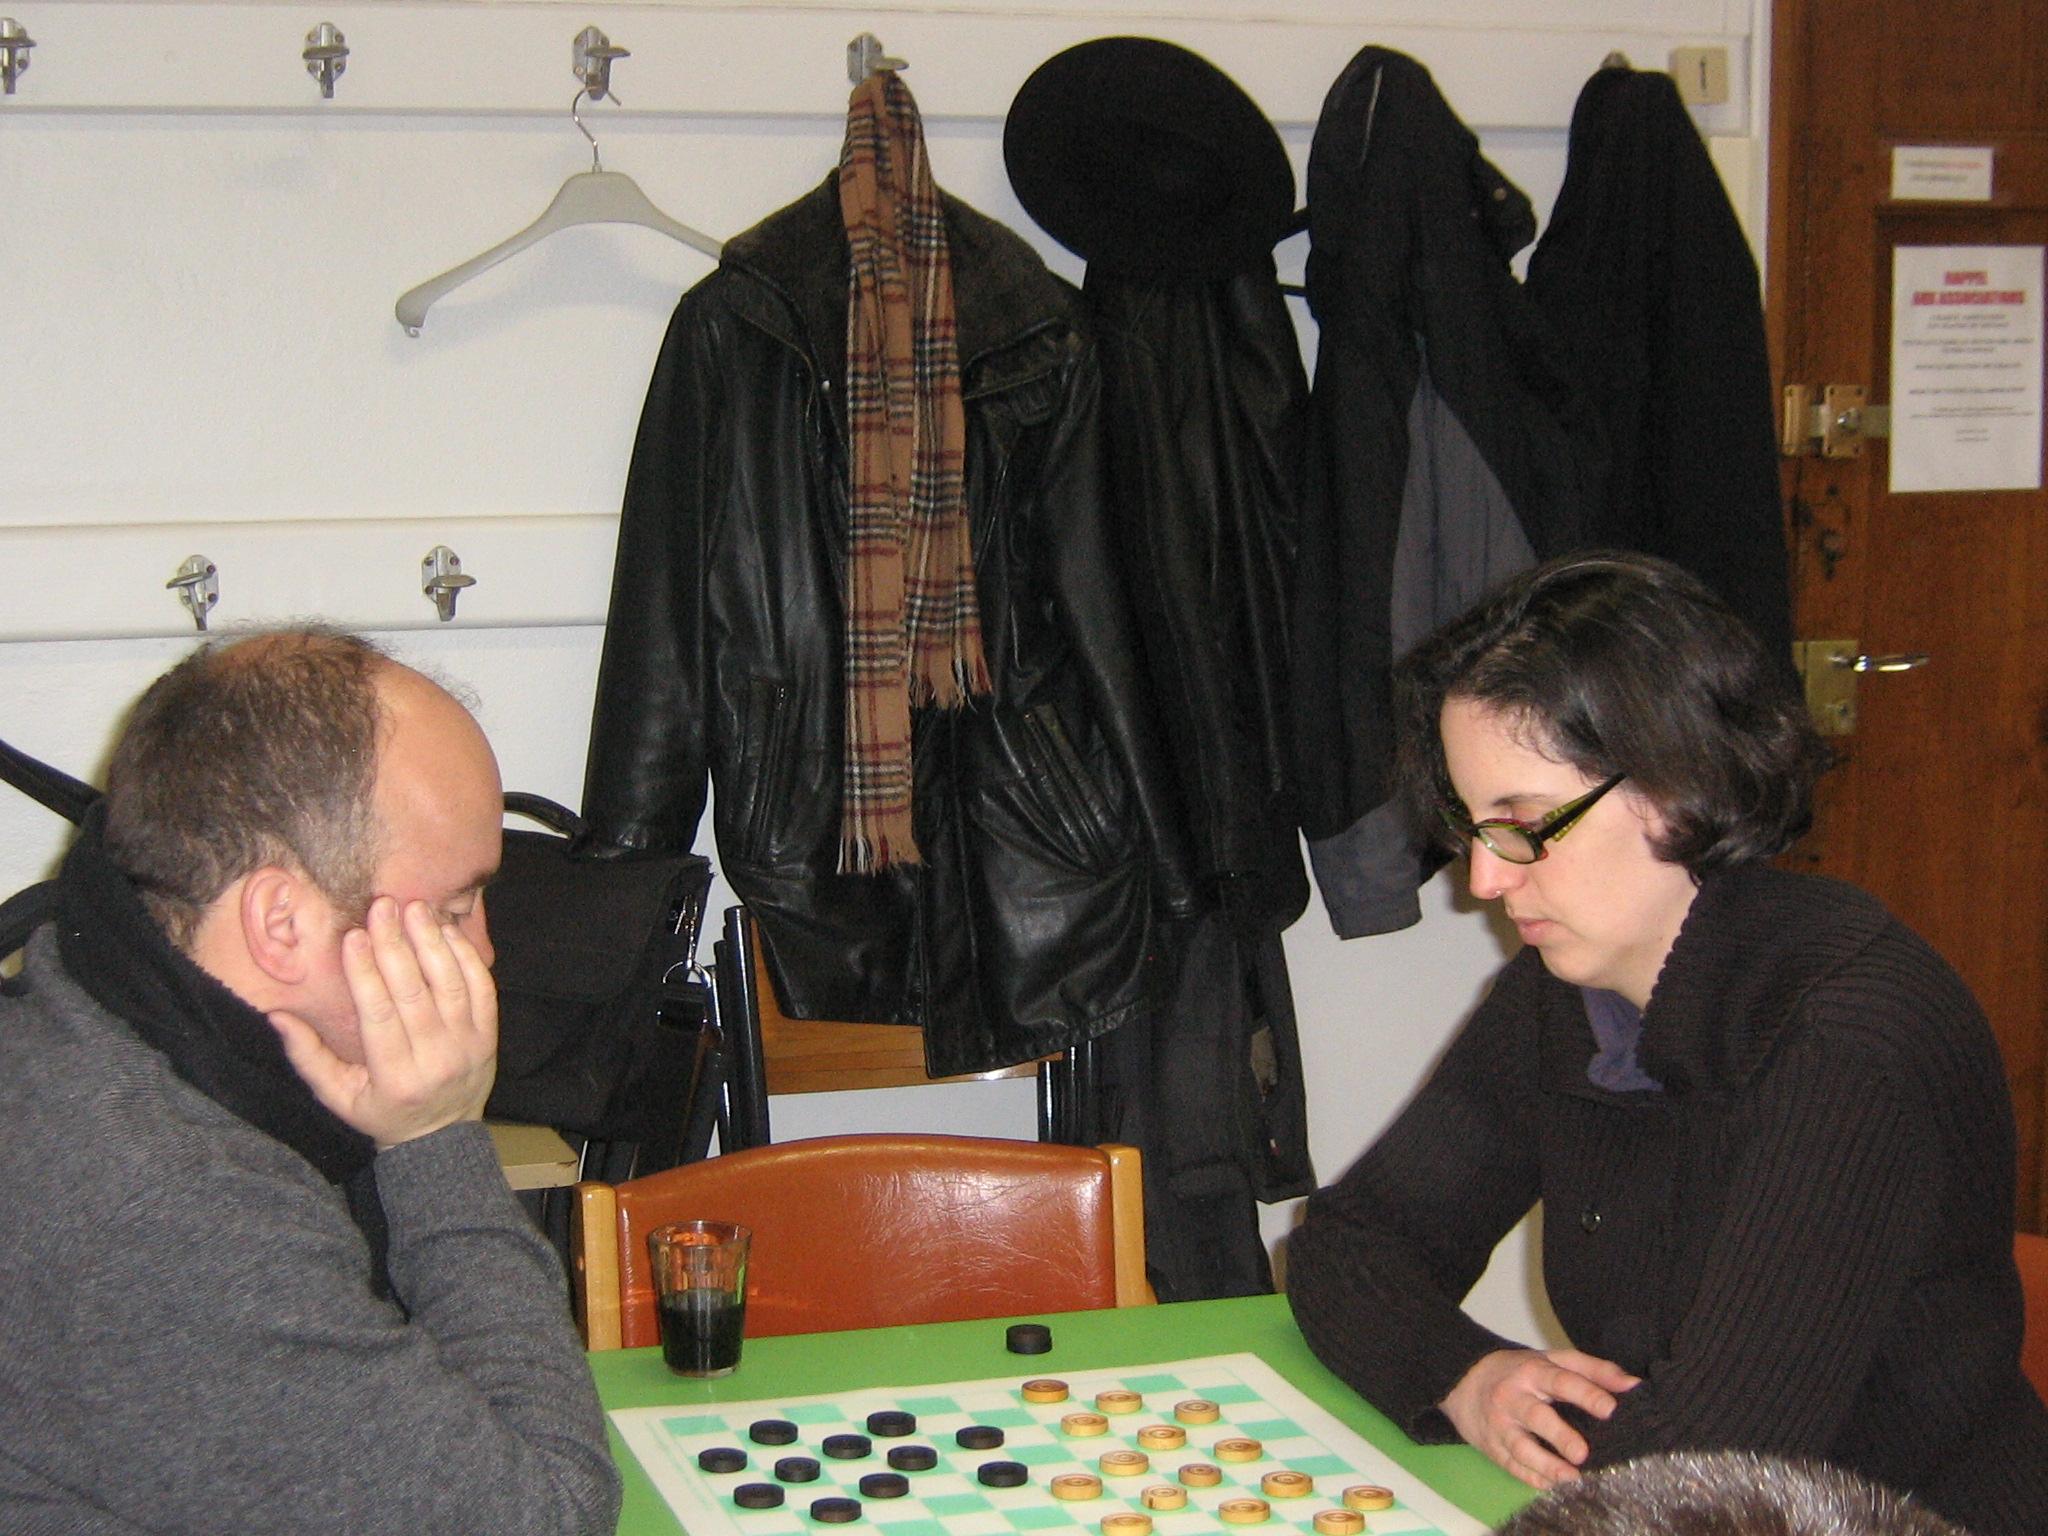 David Clain contre Nadine Peyrard